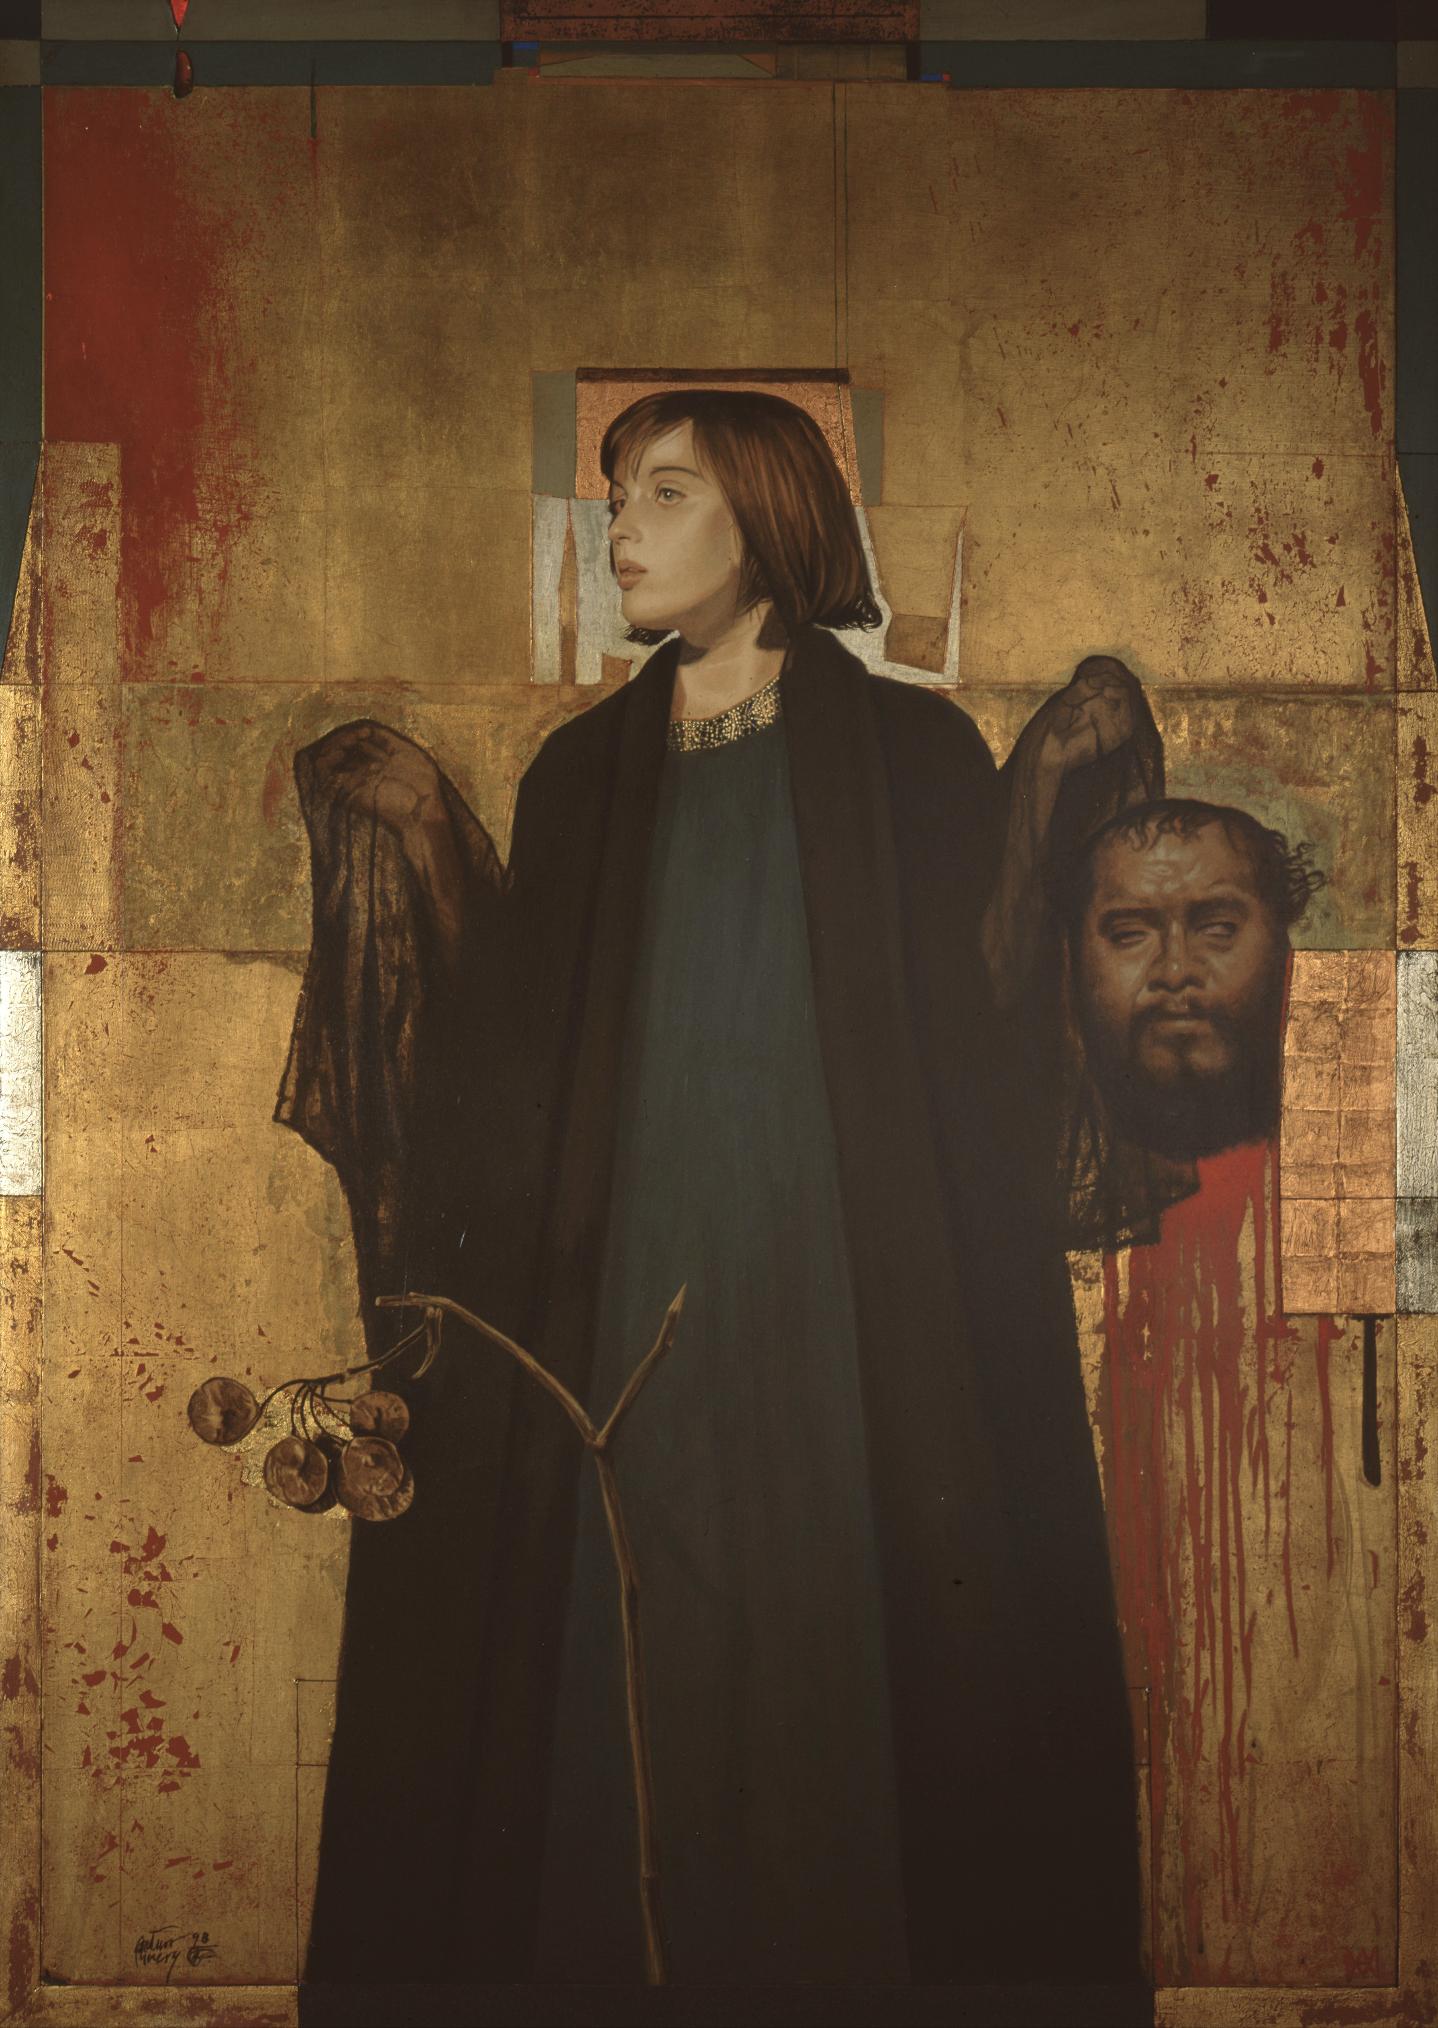 Judith's premonition